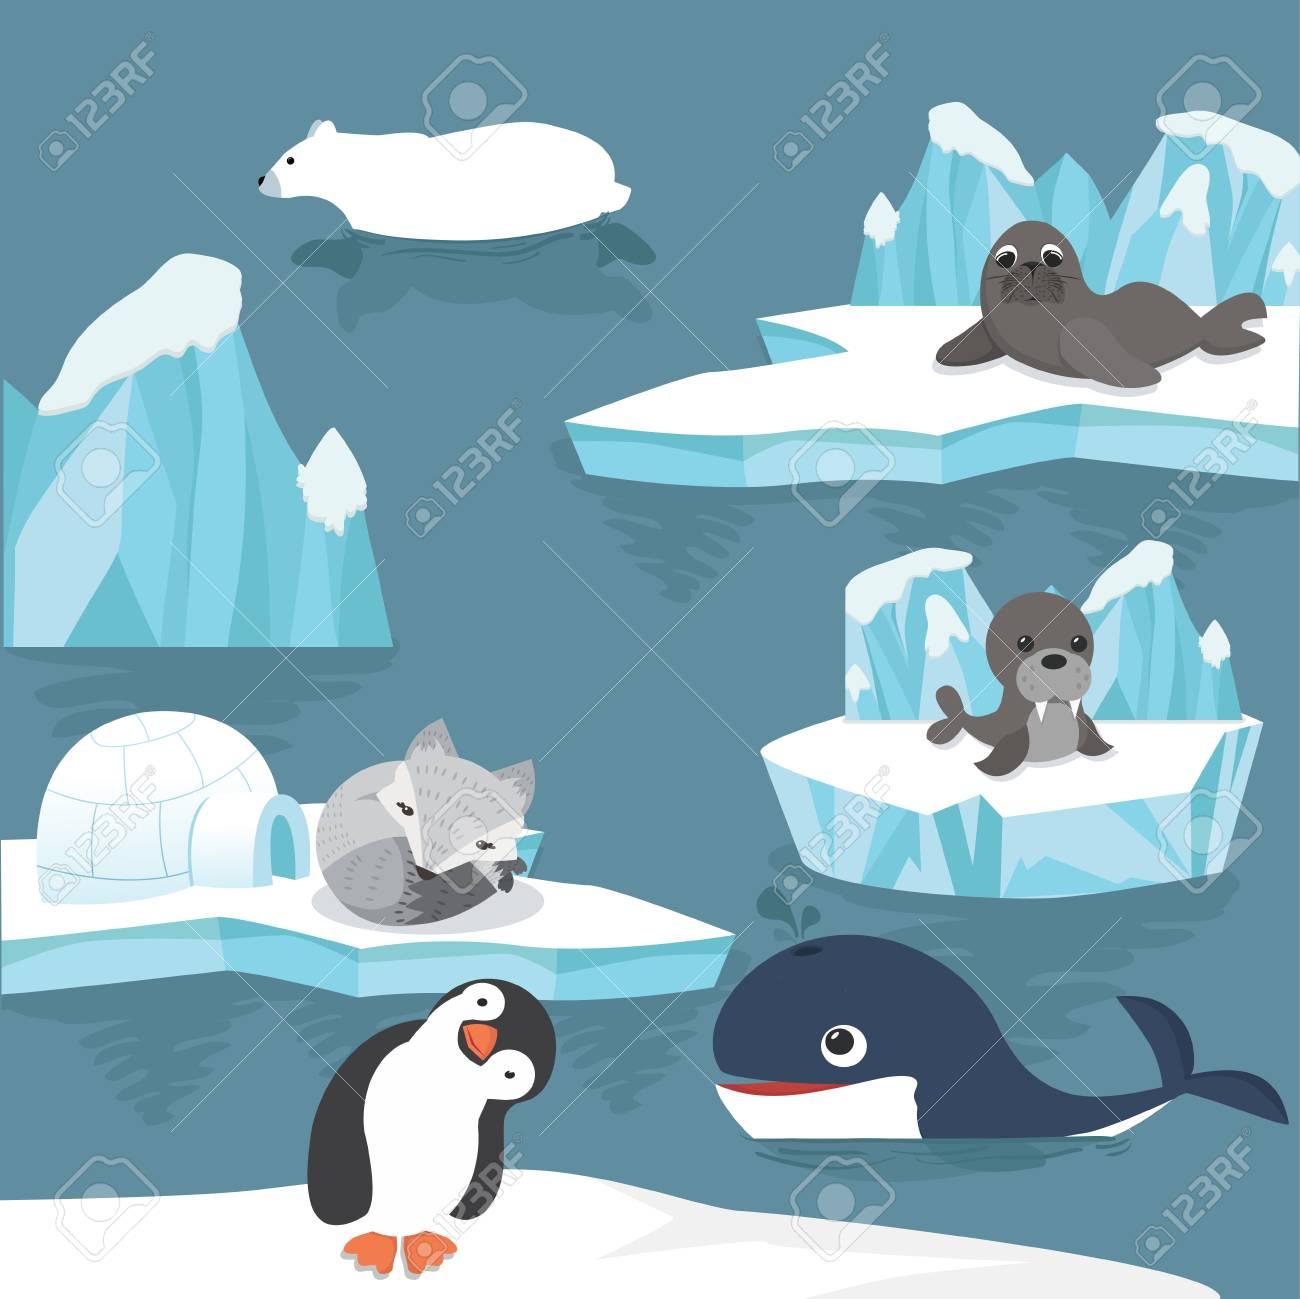 arctic animals cartoon background - 92239505